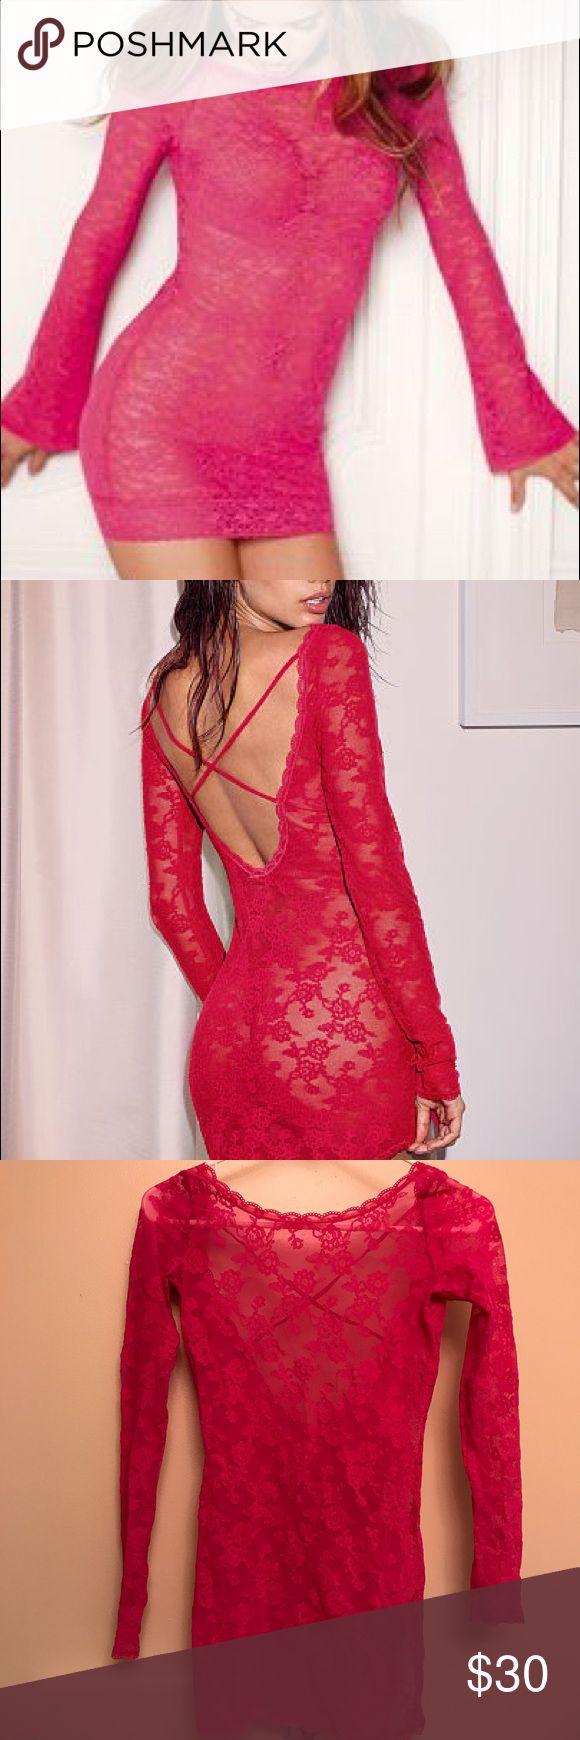 Victoria's Secret Lingerie Hot Pink VS Boatneck Crossback Babydoll - Super Sexy - XS Victoria's Secret Intimates & Sleepwear